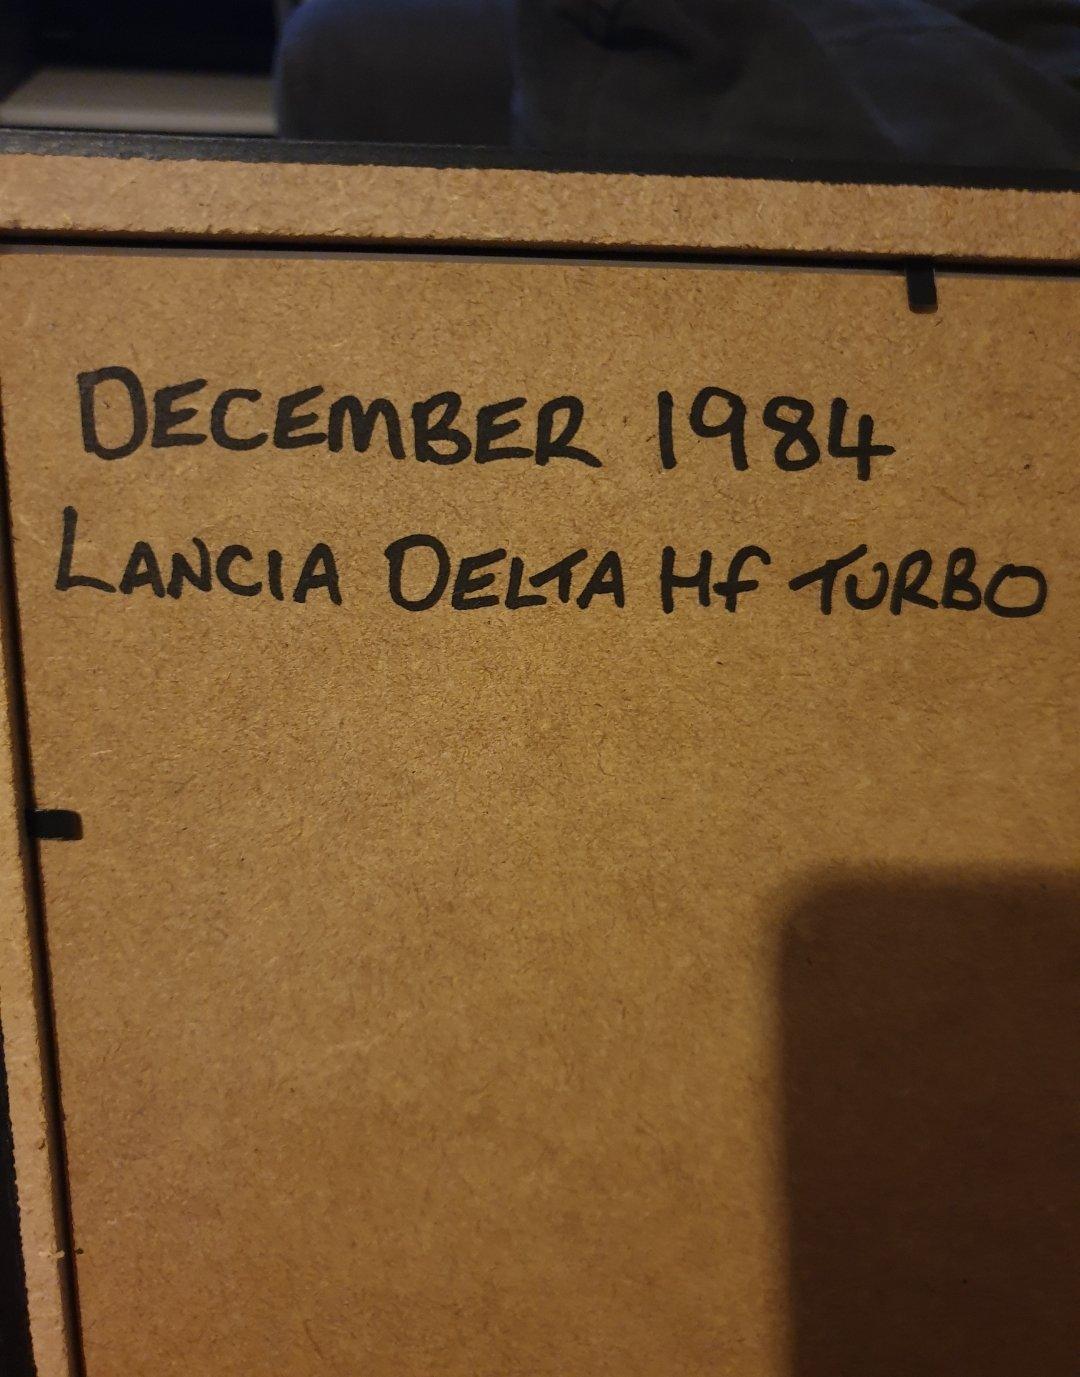 1984 Original Lancia Delta Turbo Advert For Sale (picture 2 of 3)